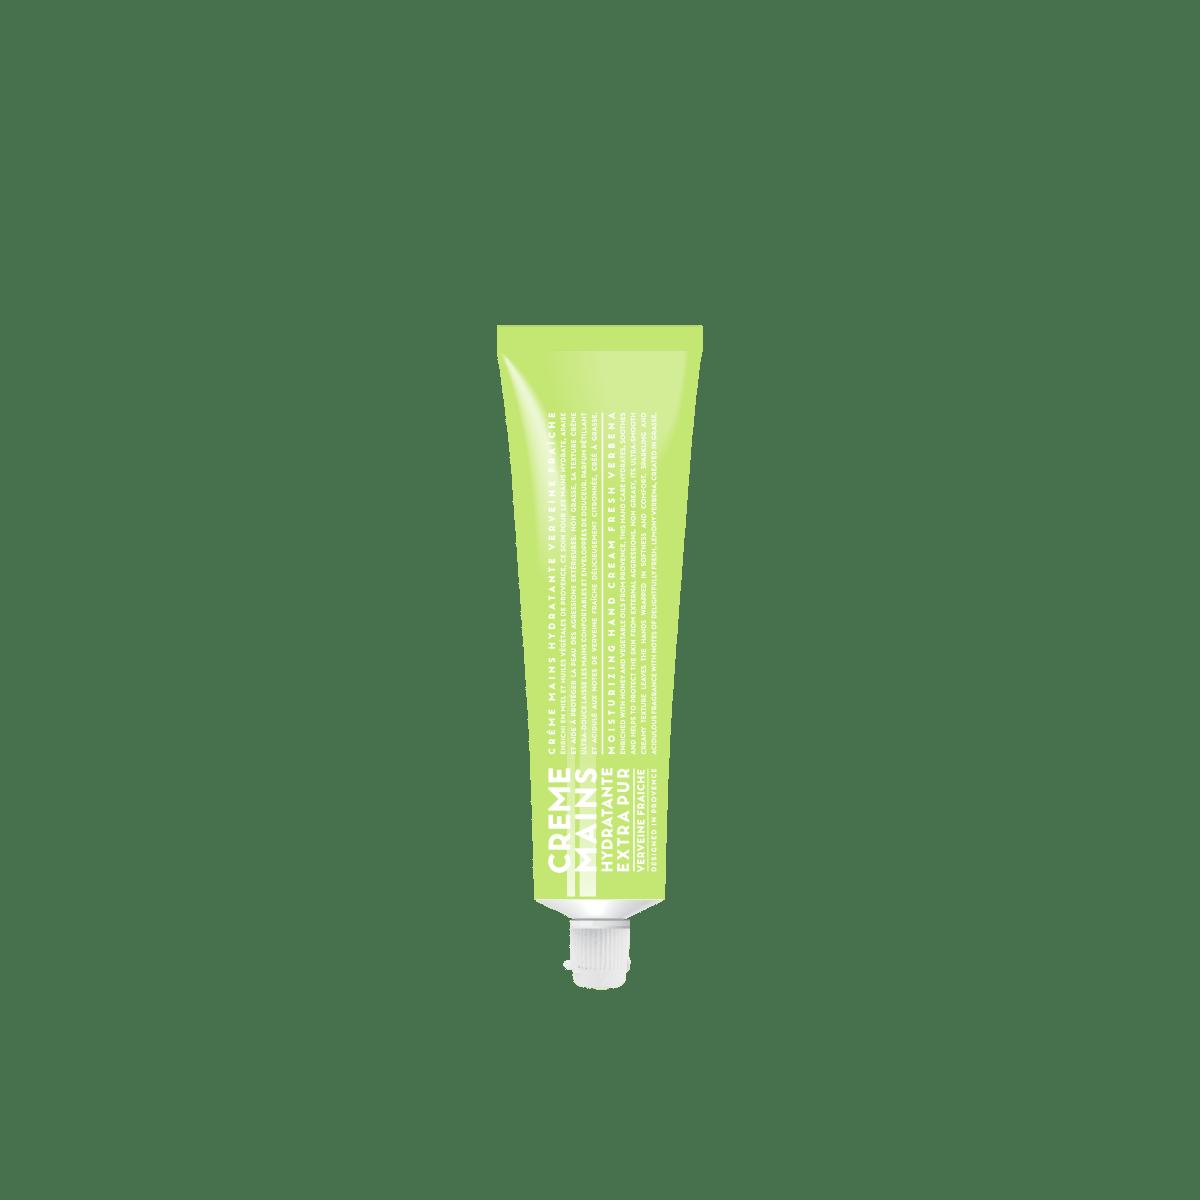 Compagnie de Provence Verbena Hand Cream 100ml